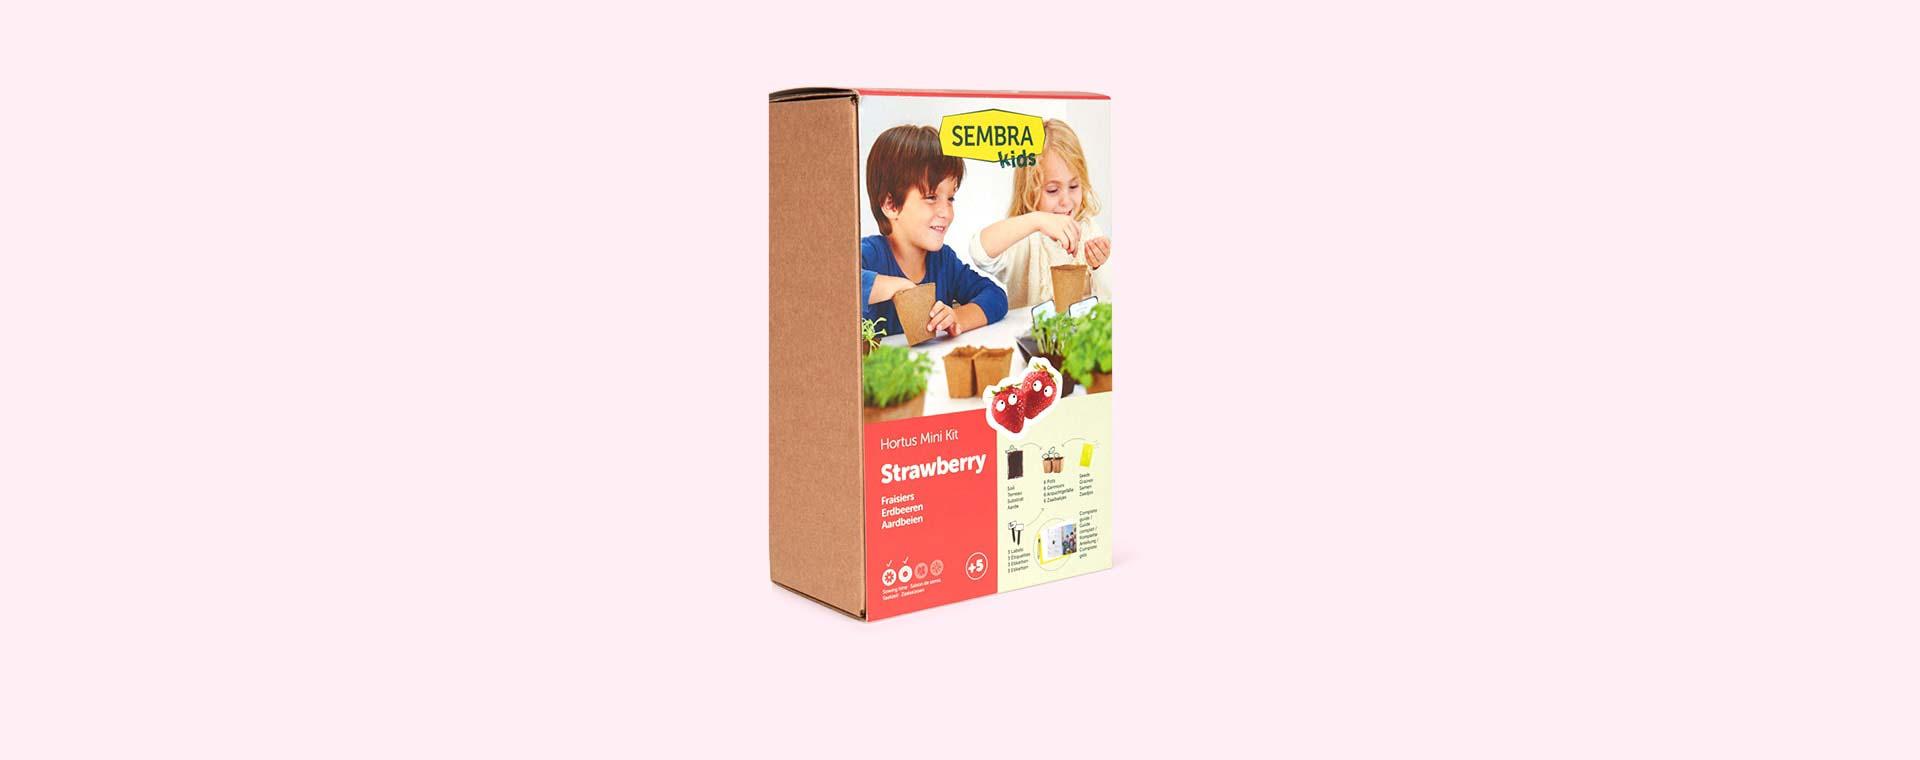 Strawberry Sembra Kids Standard Kit